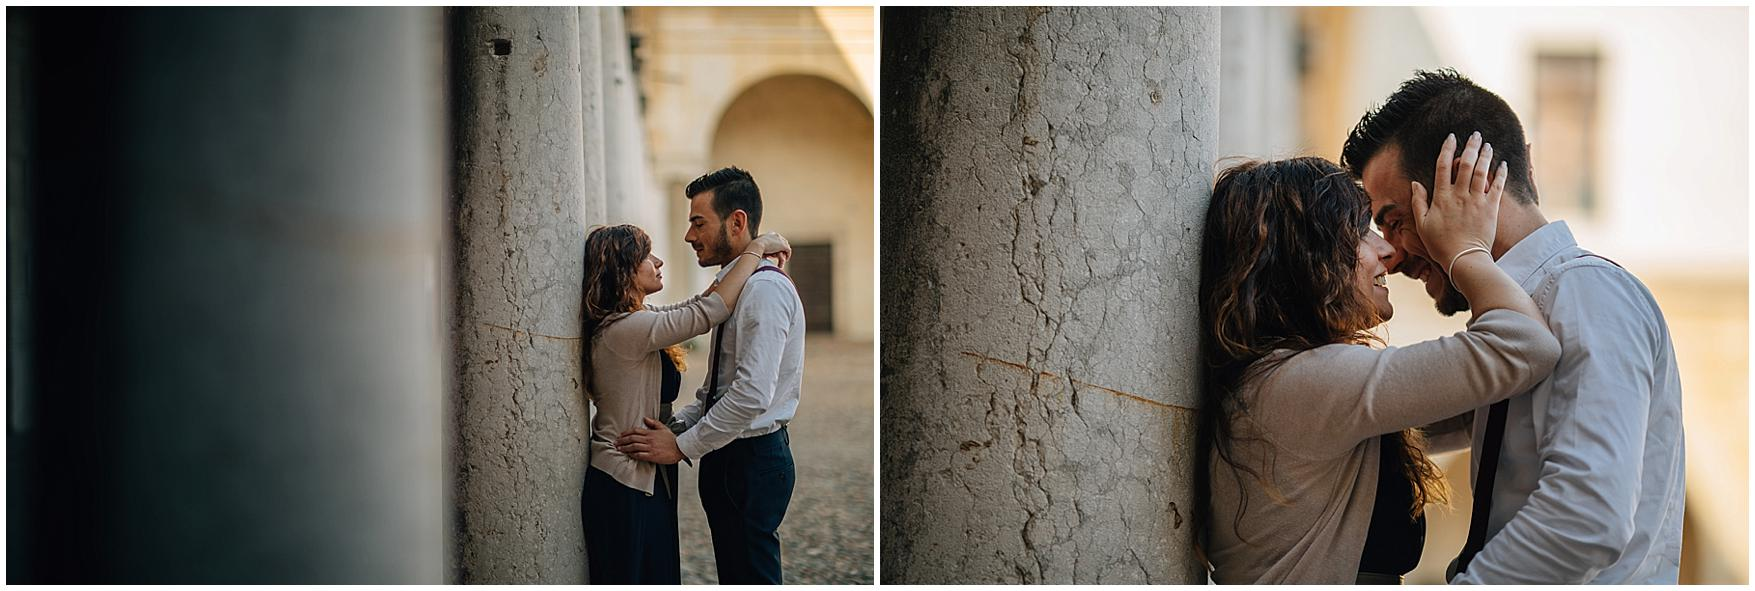 fotografo matrimonio Mantova_0002